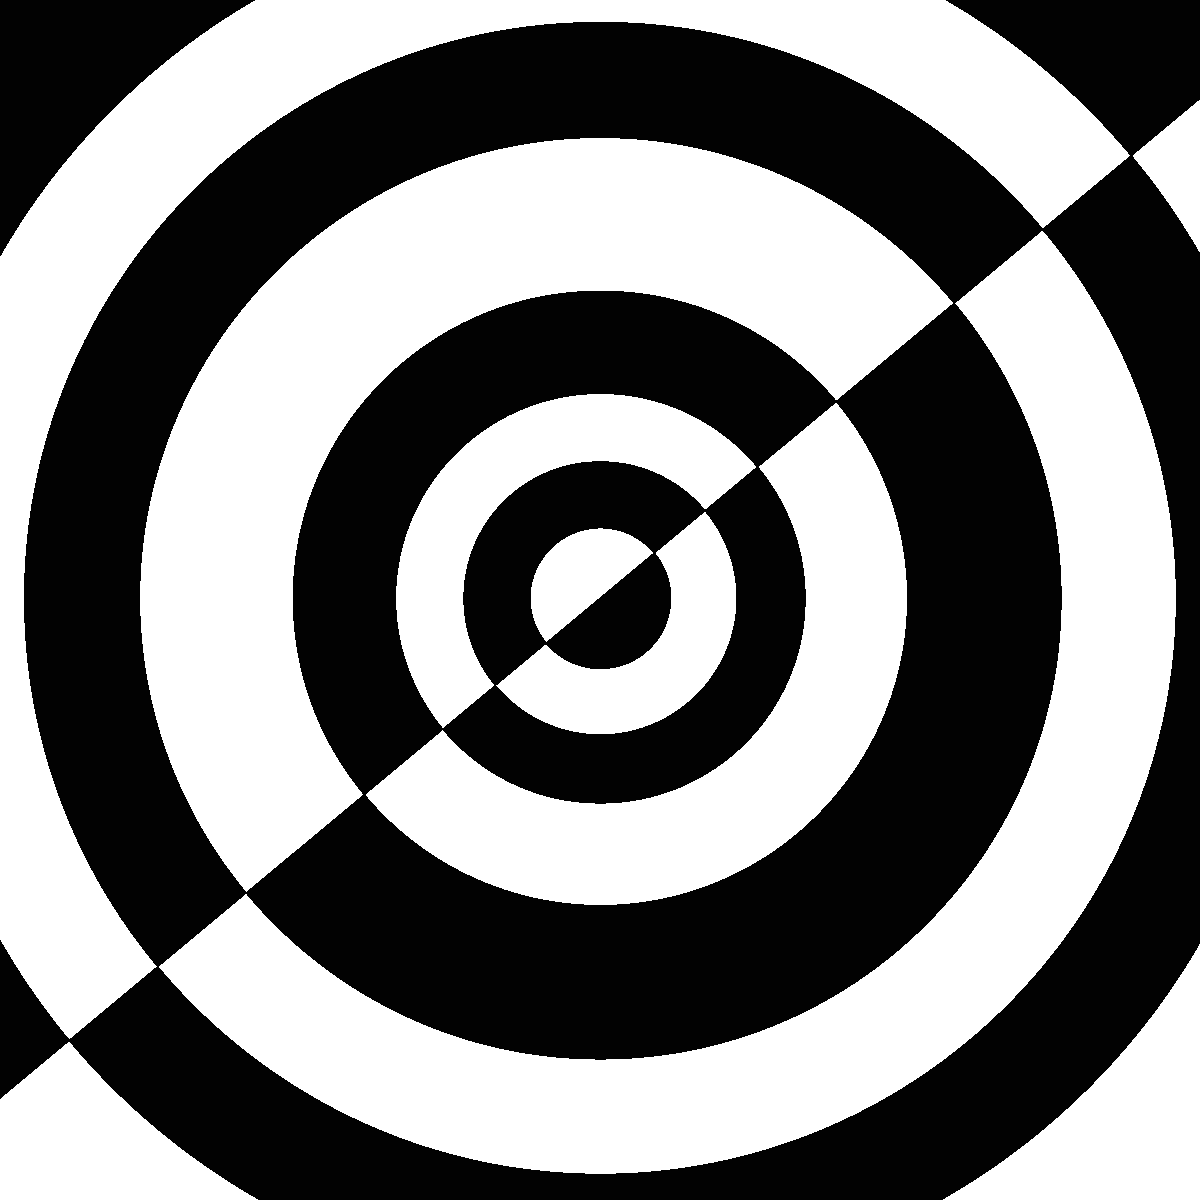 stickers muraux design sticker mural illusion d 39 optique 6 ambiance. Black Bedroom Furniture Sets. Home Design Ideas